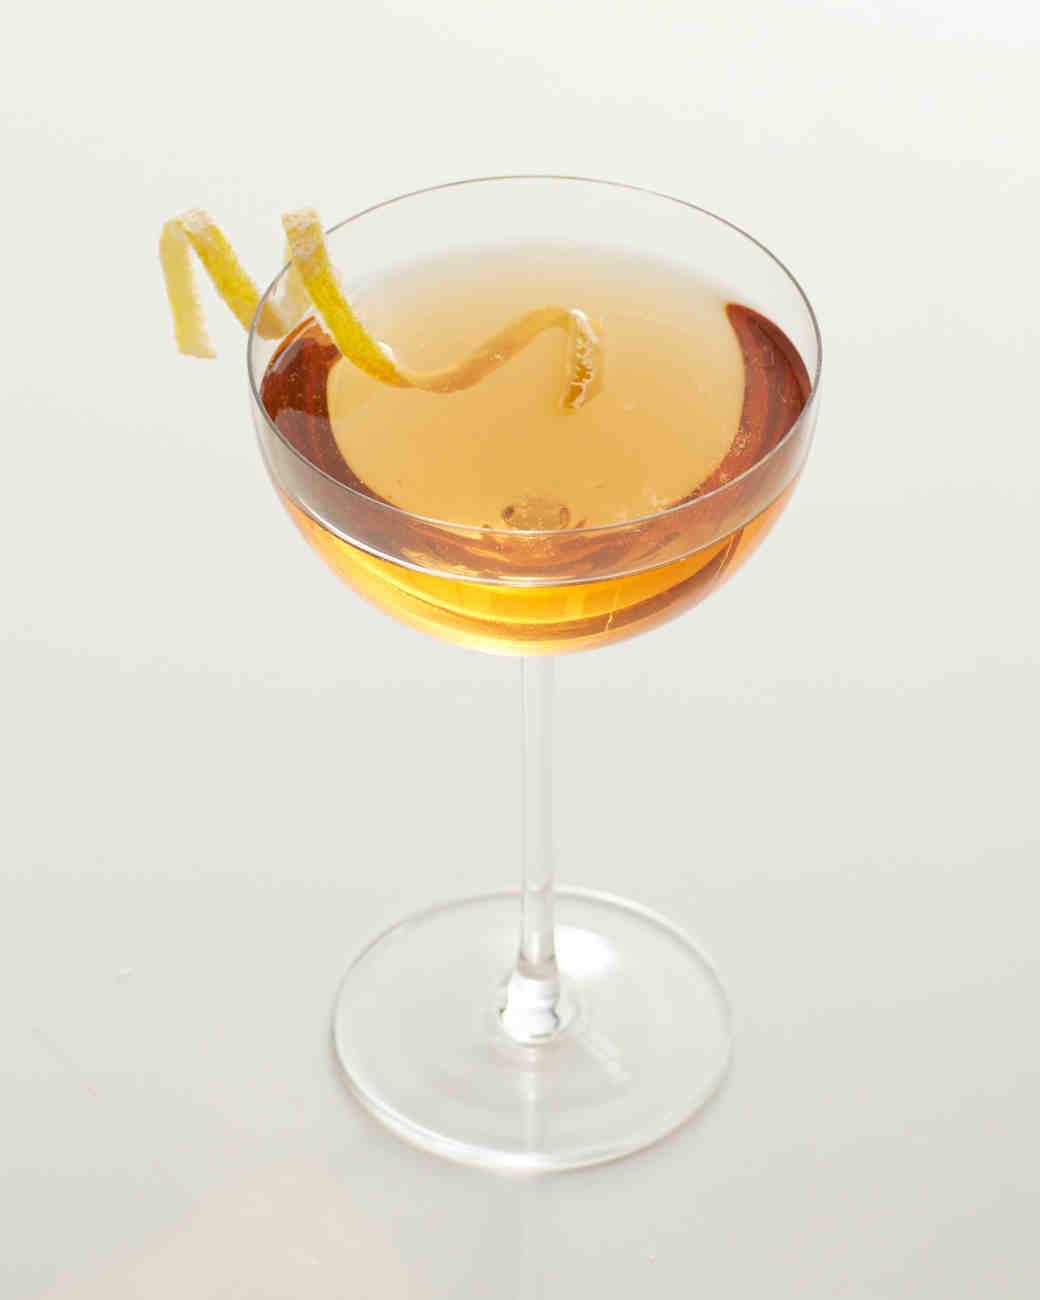 cocktails-sazerac-130-d111018-0514.jpg